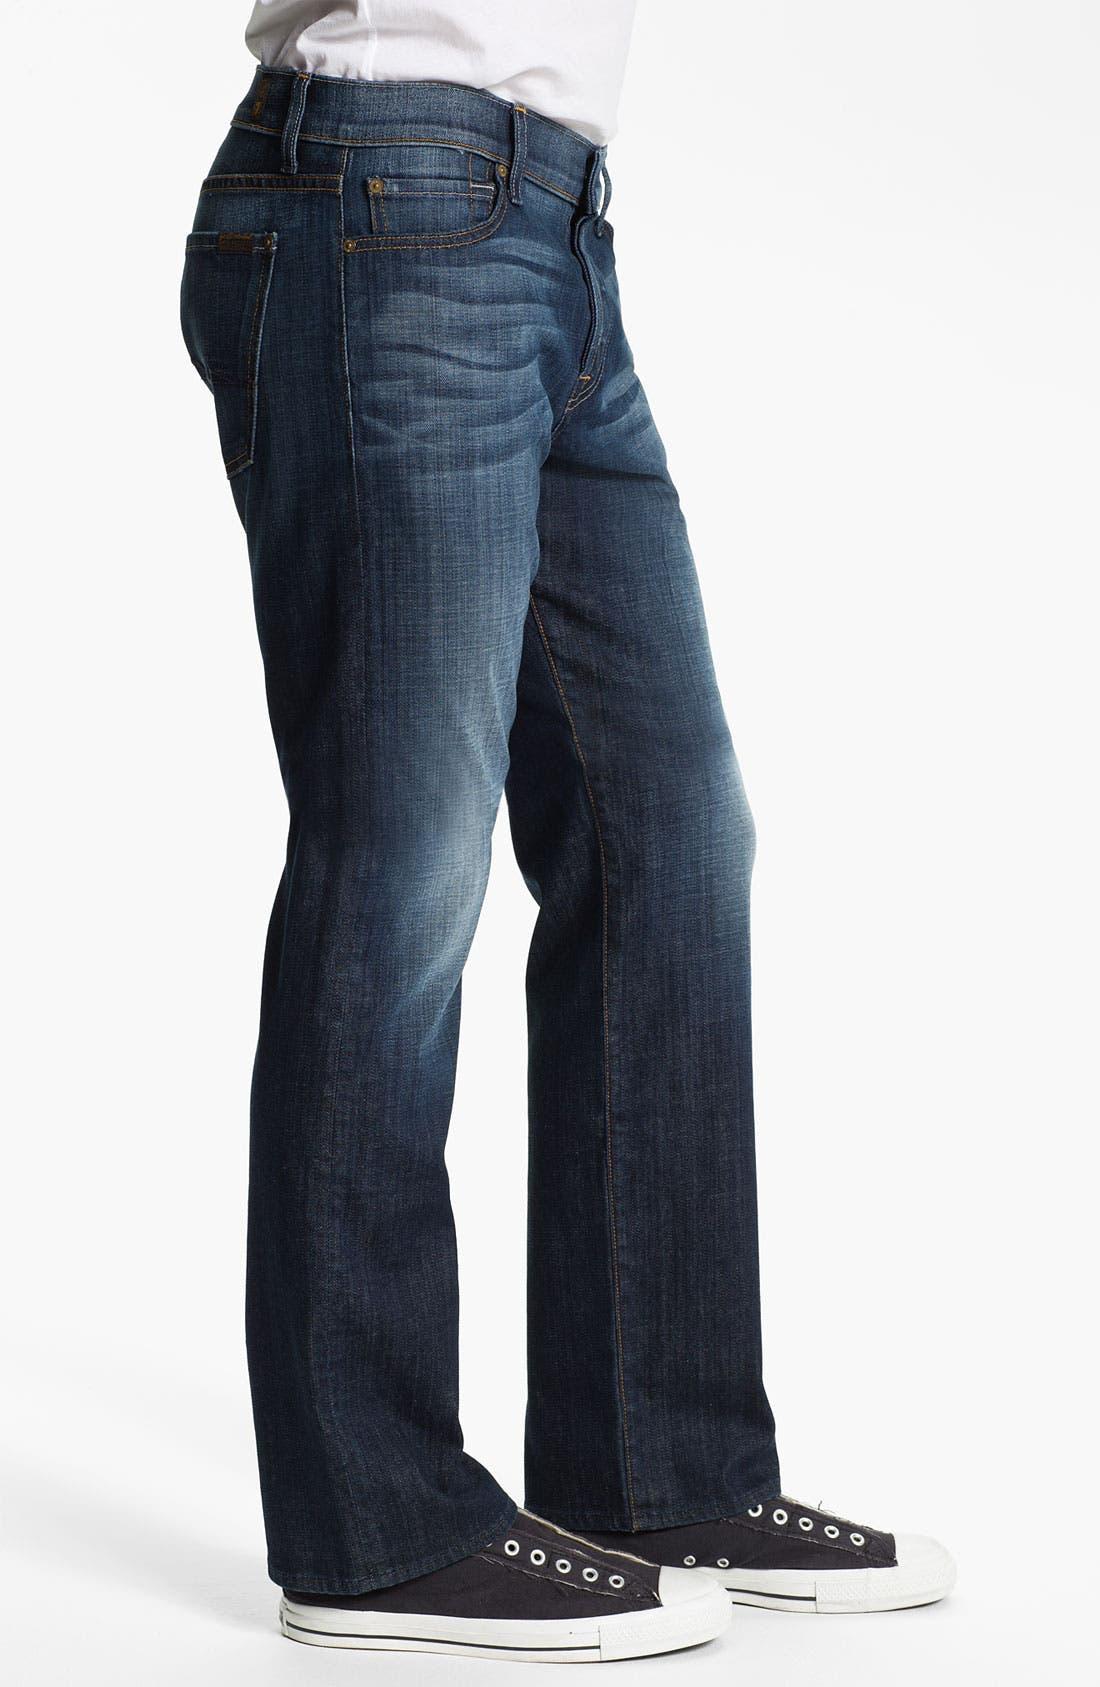 Alternate Image 3  - 7 For All Mankind® 'Standard' Straight Leg Jeans (Worn L.A. Dark)